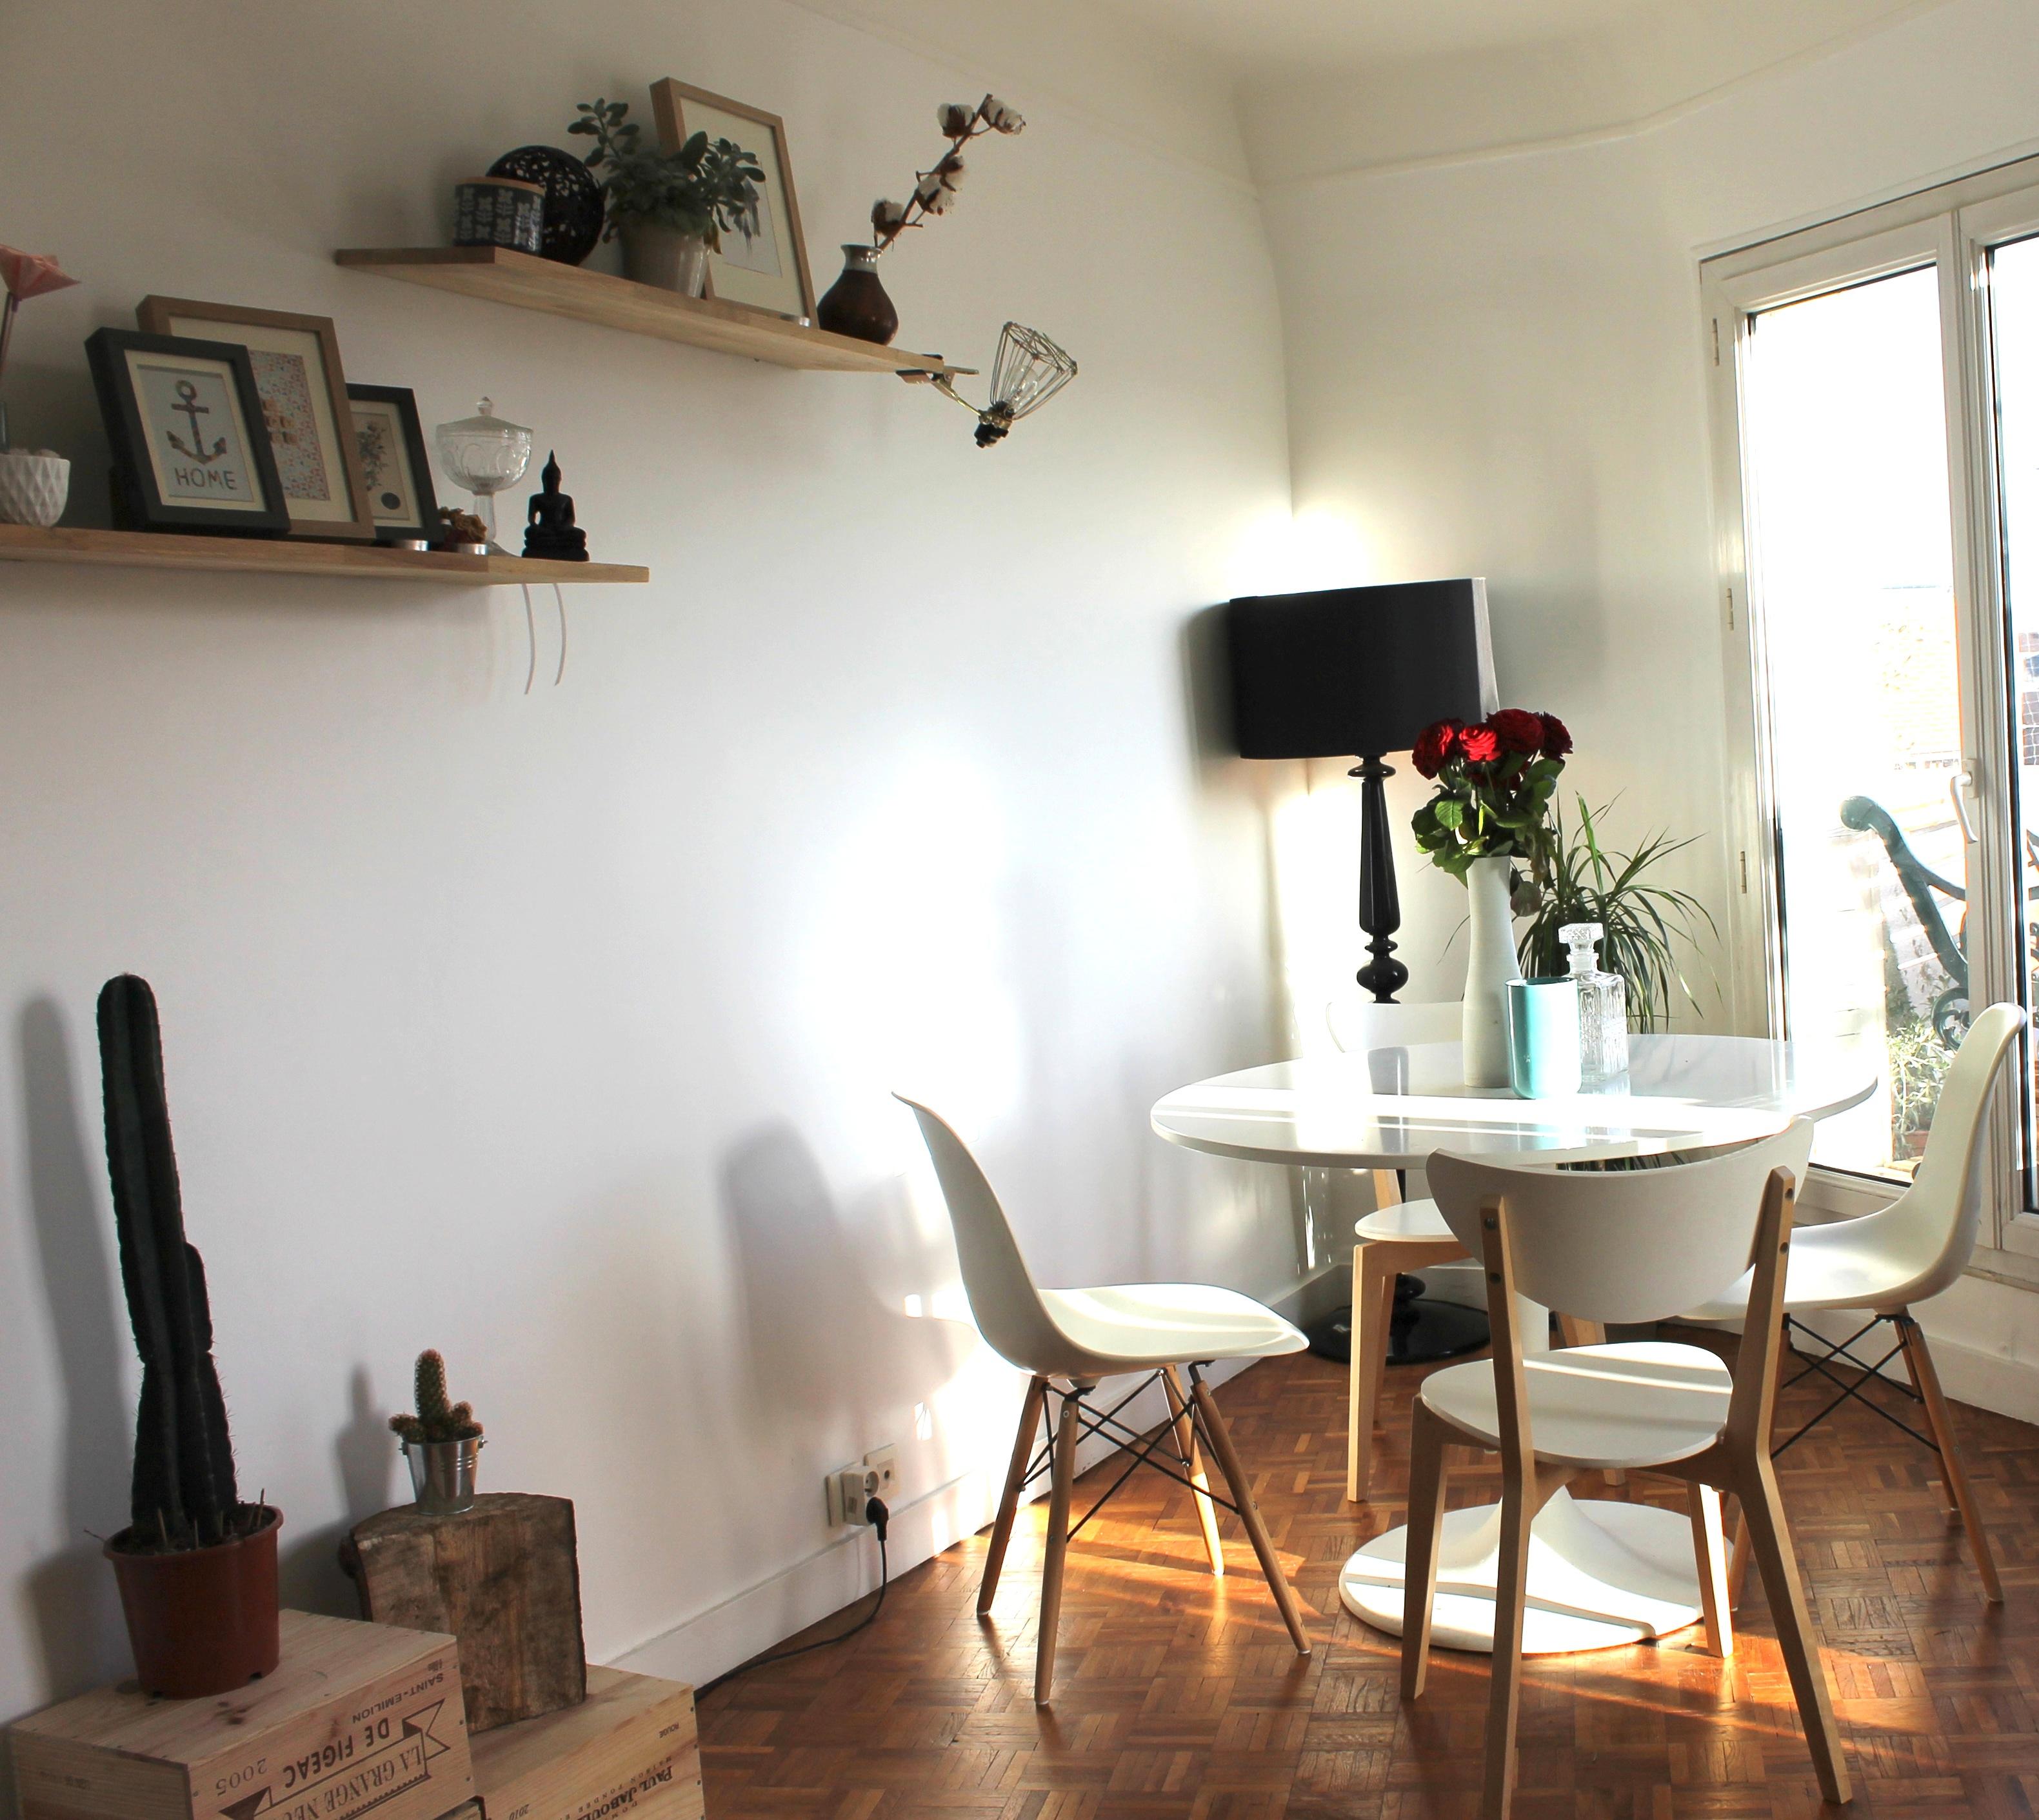 bienvenue chez moi salle manger rise and shine. Black Bedroom Furniture Sets. Home Design Ideas